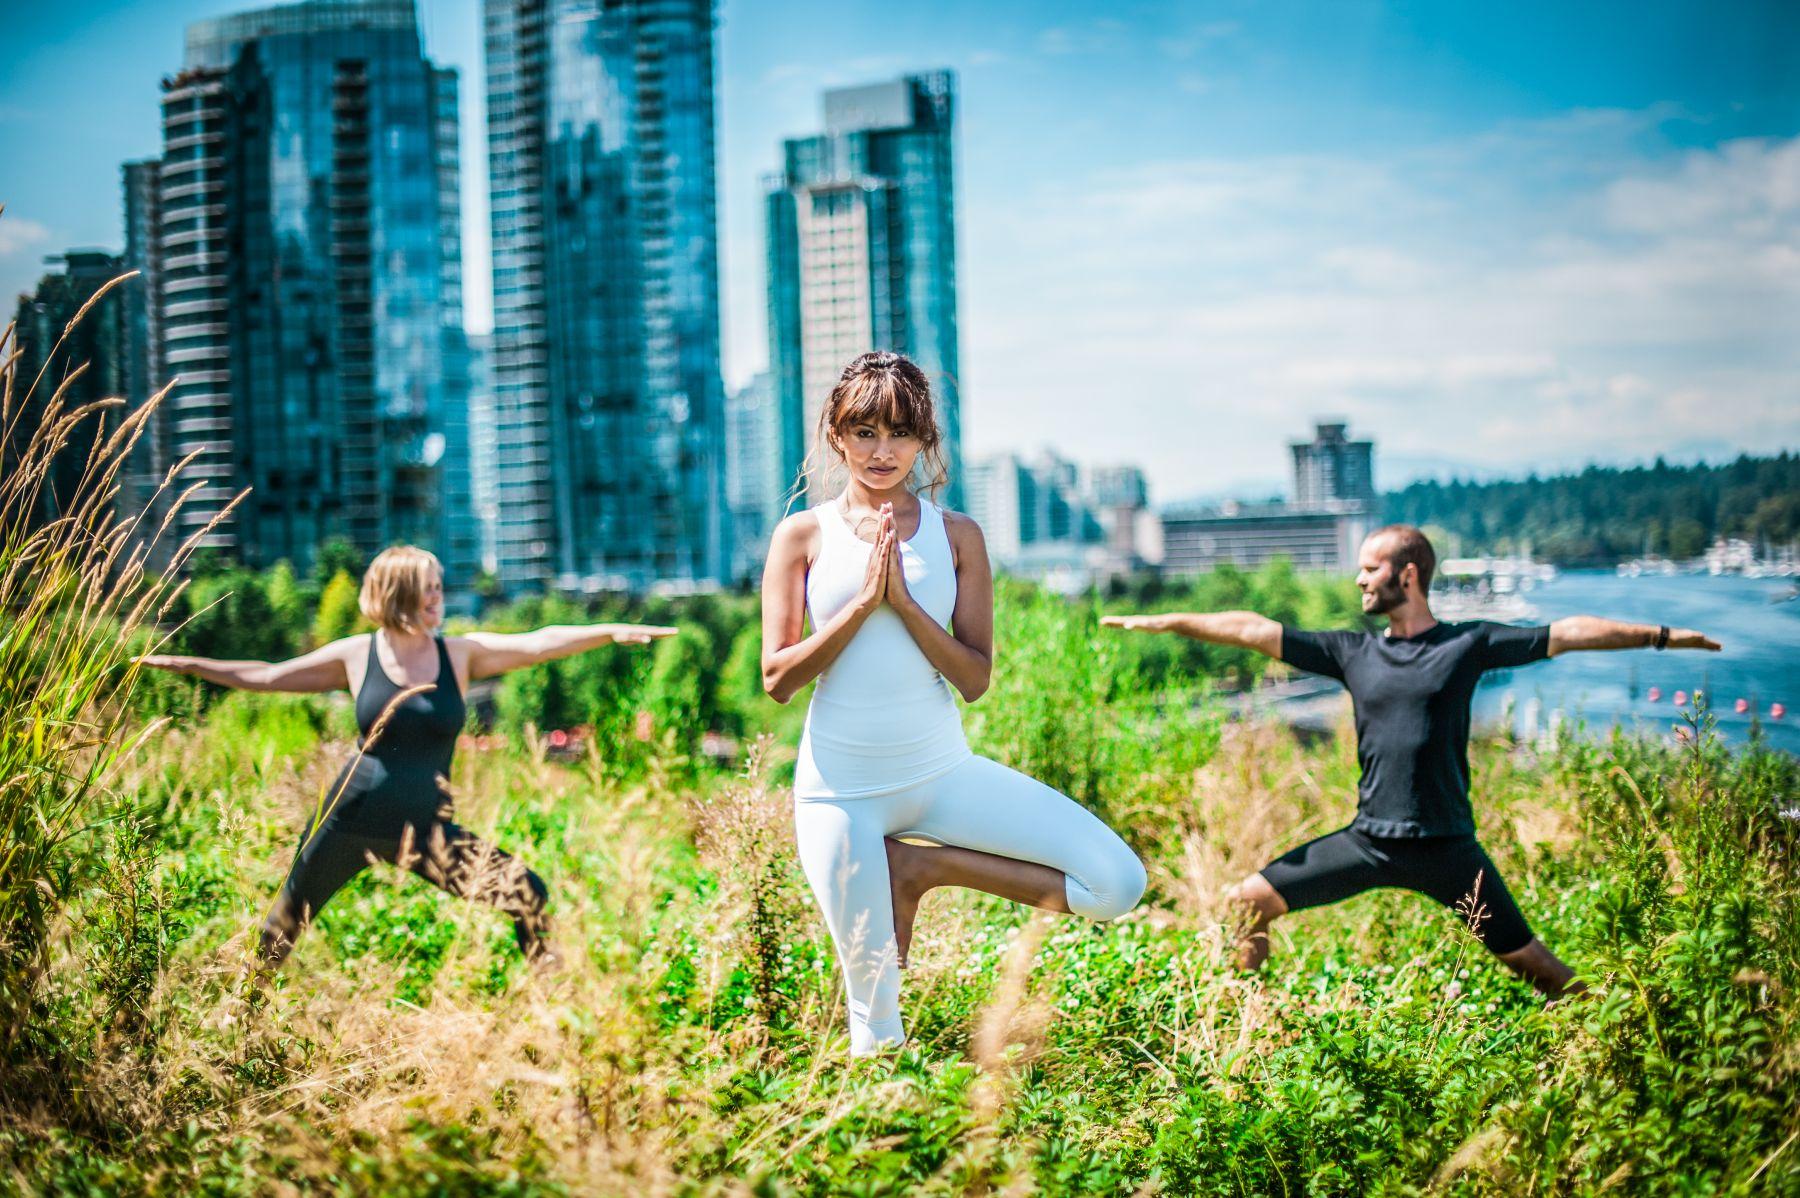 Fitness meets fashion with FIRMA Energywear